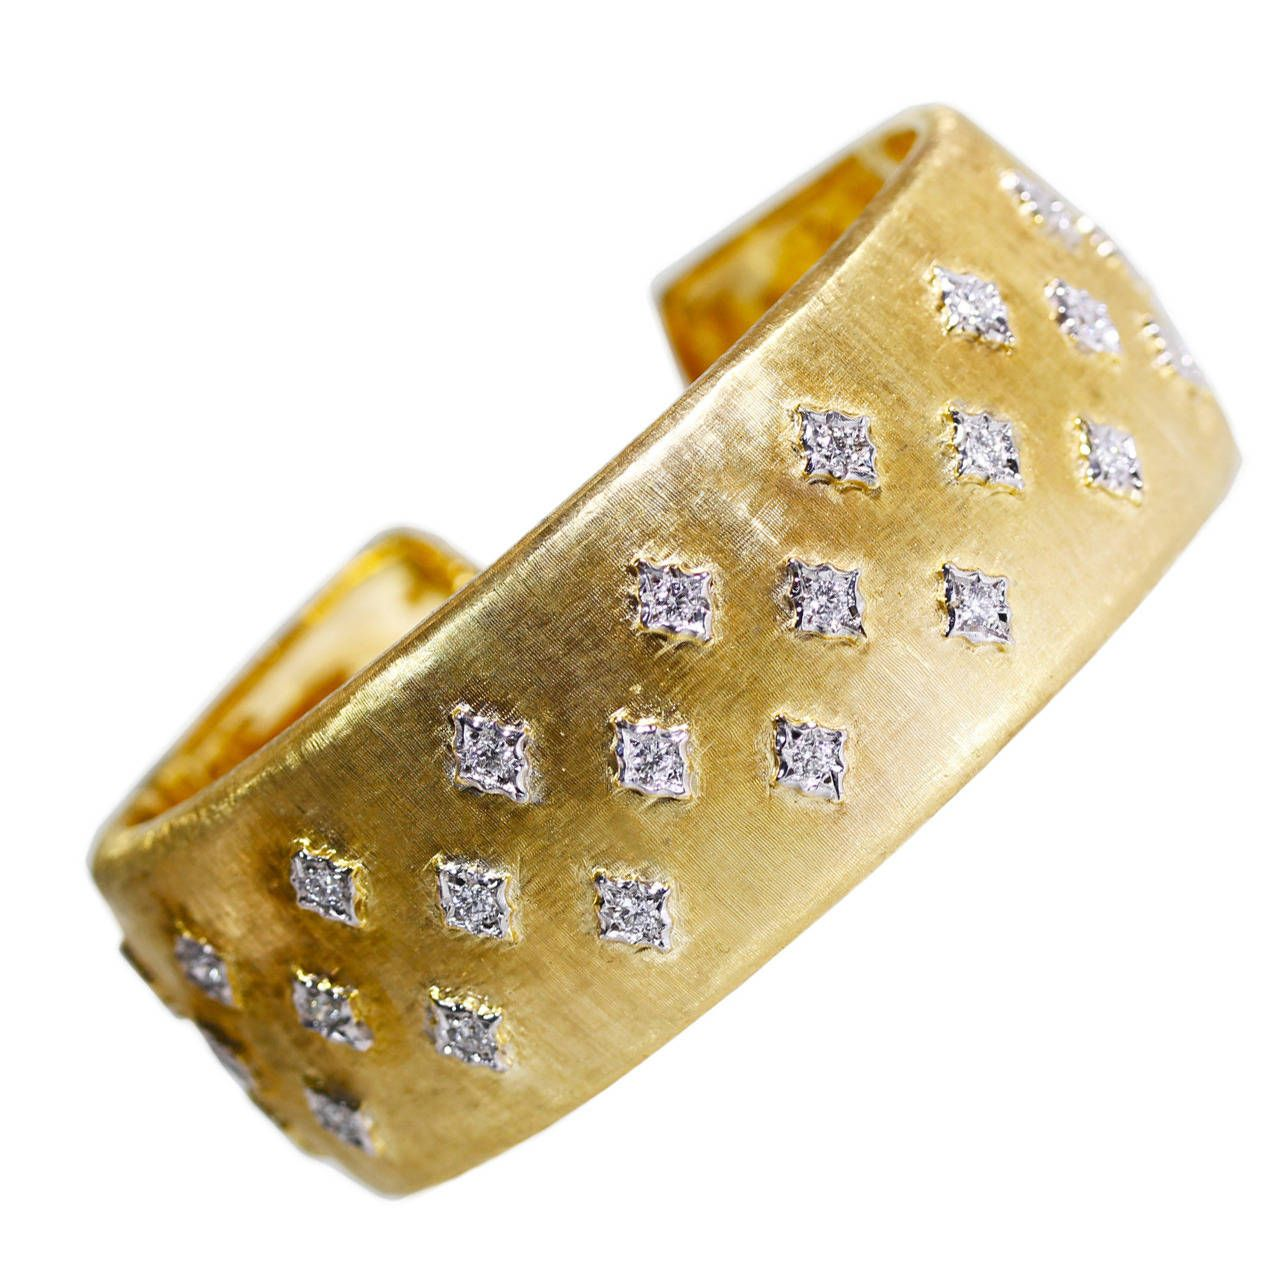 Buccellati Diamond Gold Cuff Bracelet   From a unique collection of vintage cuff bracelets at https://www.1stdibs.com/jewelry/bracelets/cuff-bracelets/